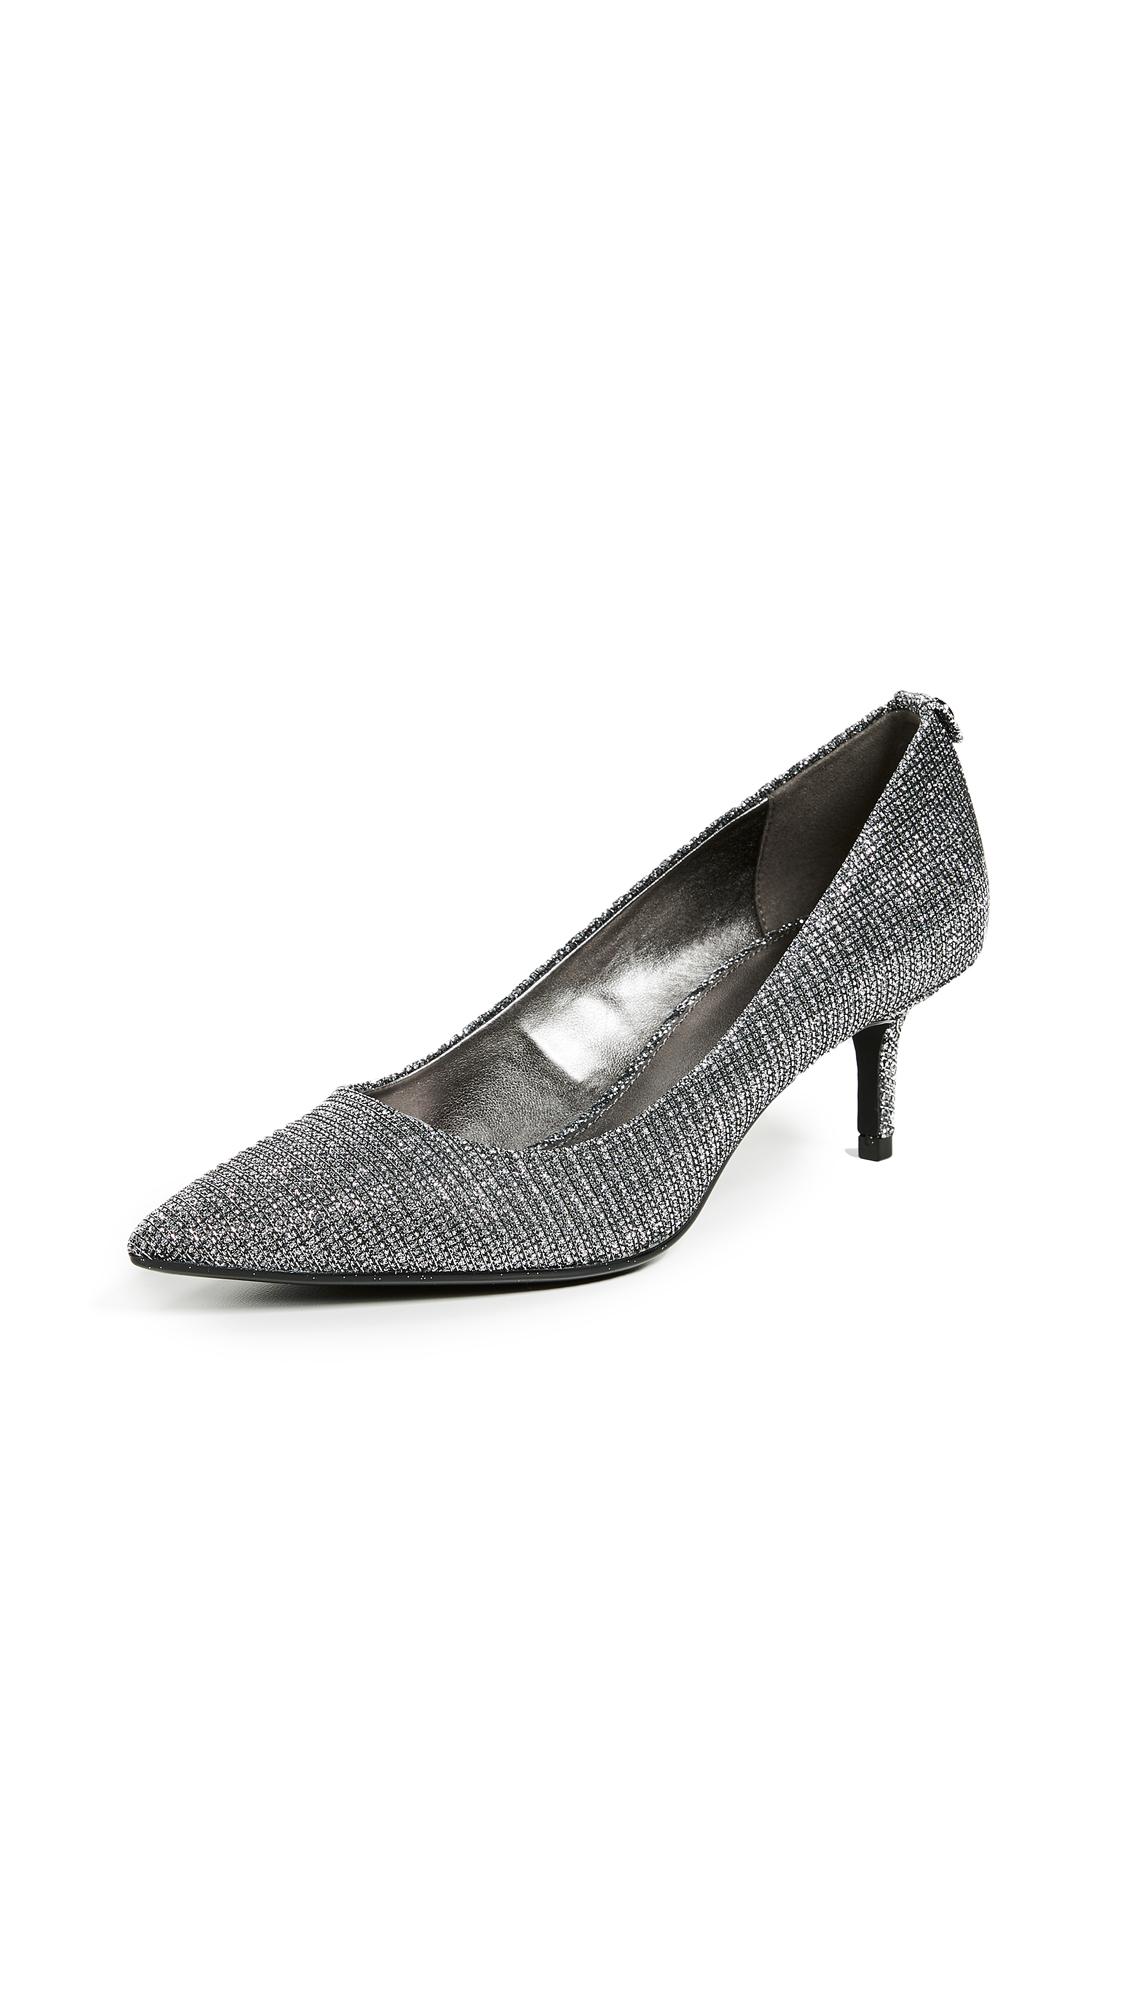 MICHAEL Michael Kors MK-Flex Kitten Heel Pumps - Black/Silver